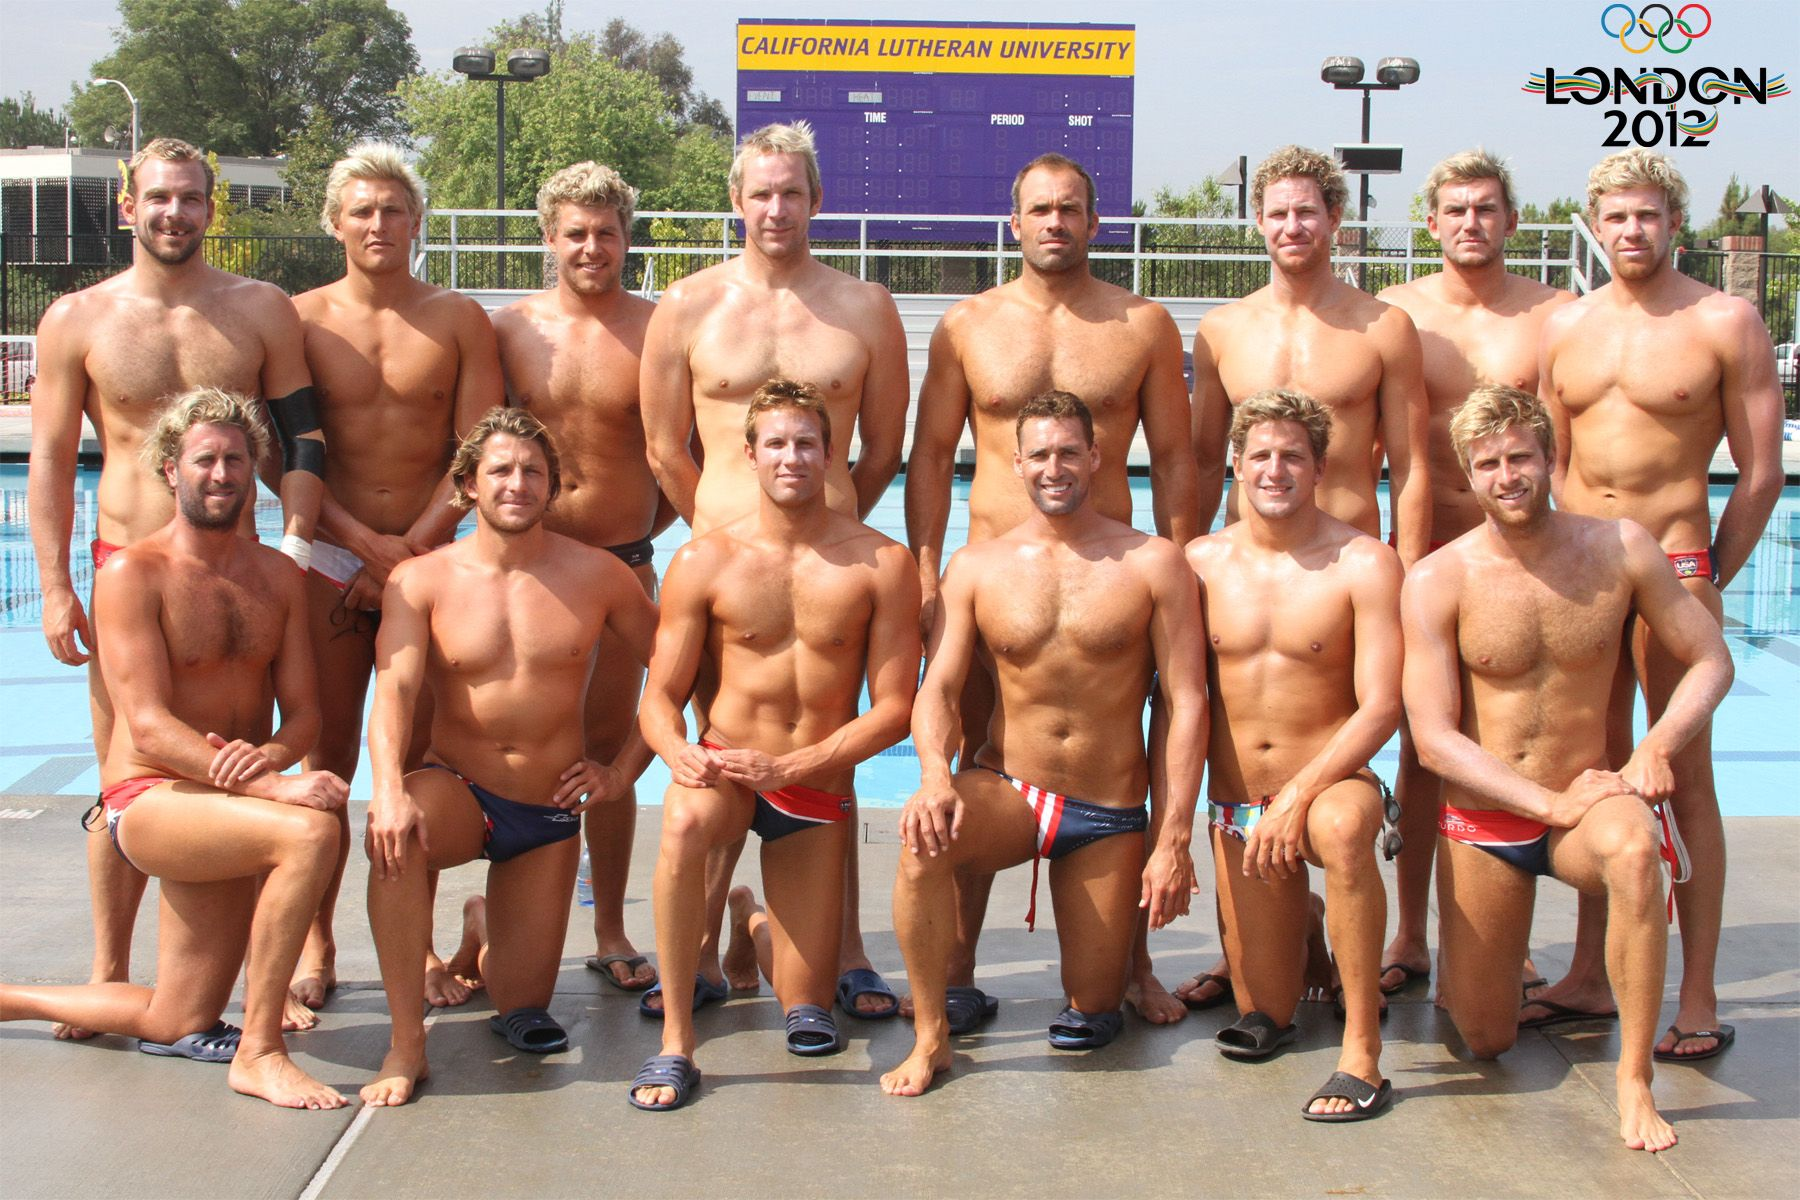 2012 US Men's Water Polo team...USA USA